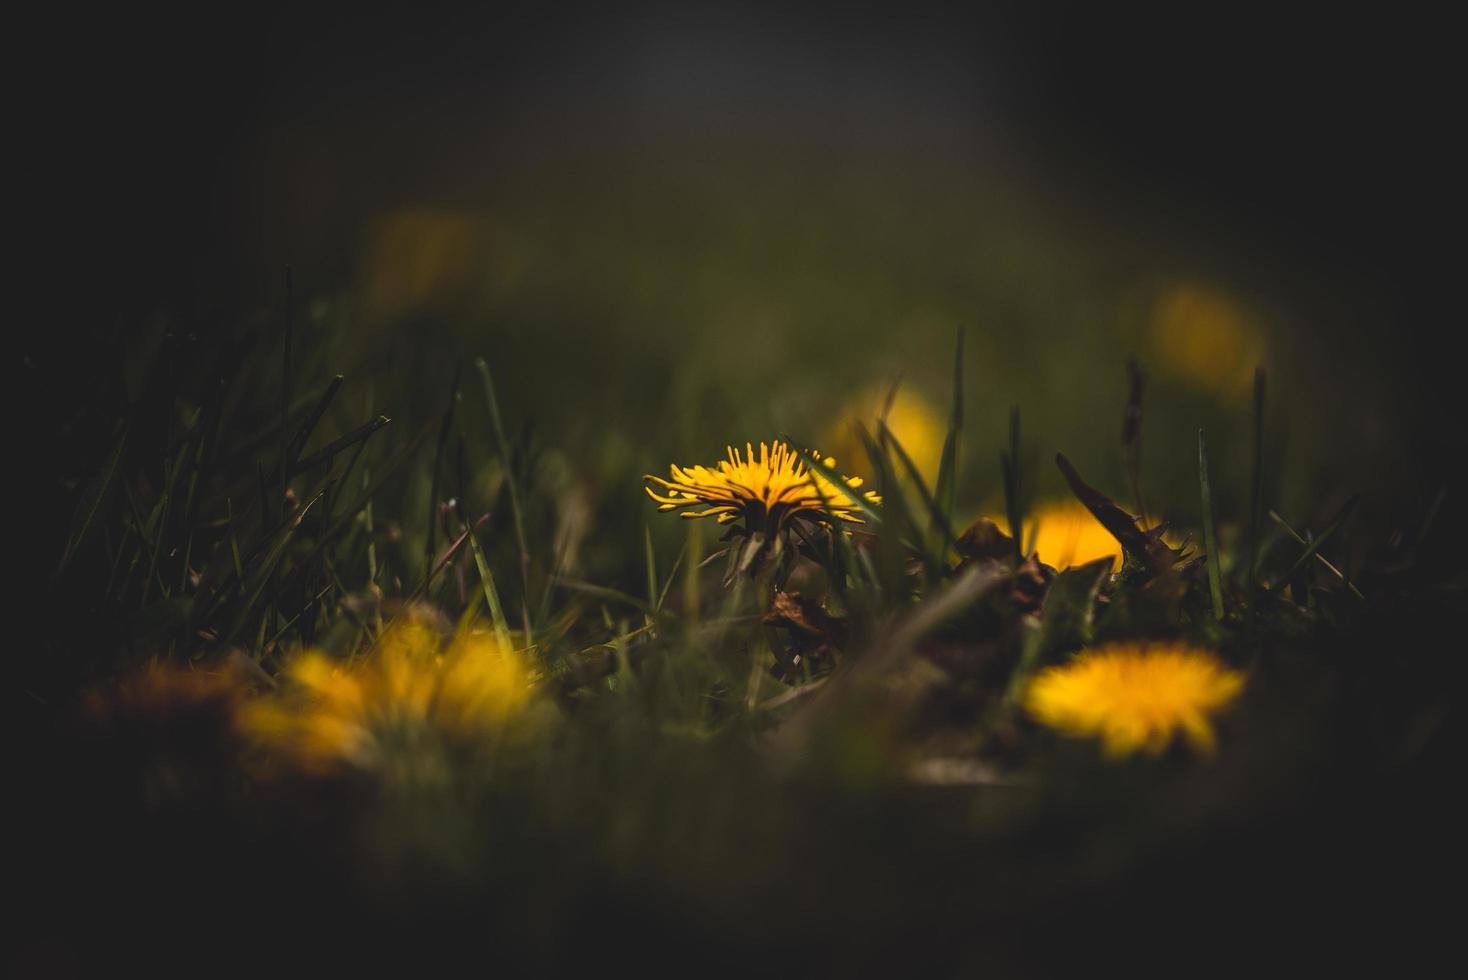 Yellow dandelions in dark field photo